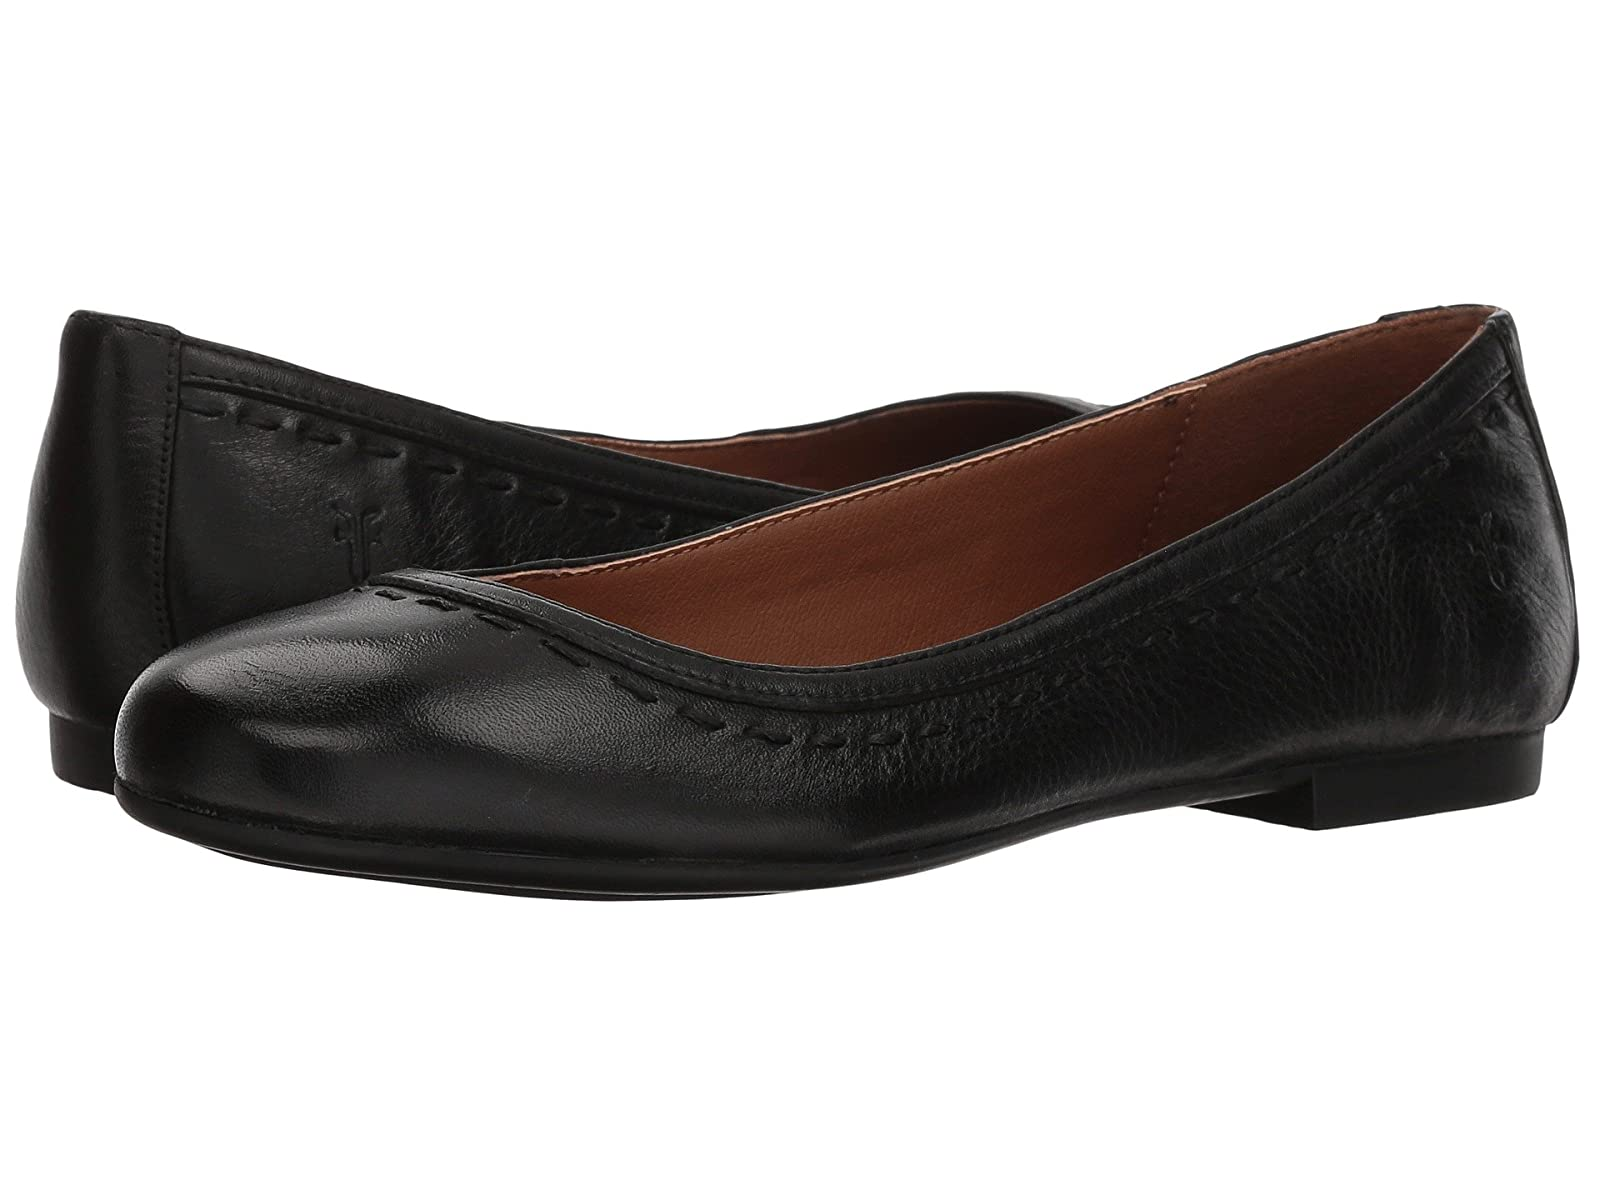 Frye Tinsley Stitch BalletAtmospheric grades have affordable shoes